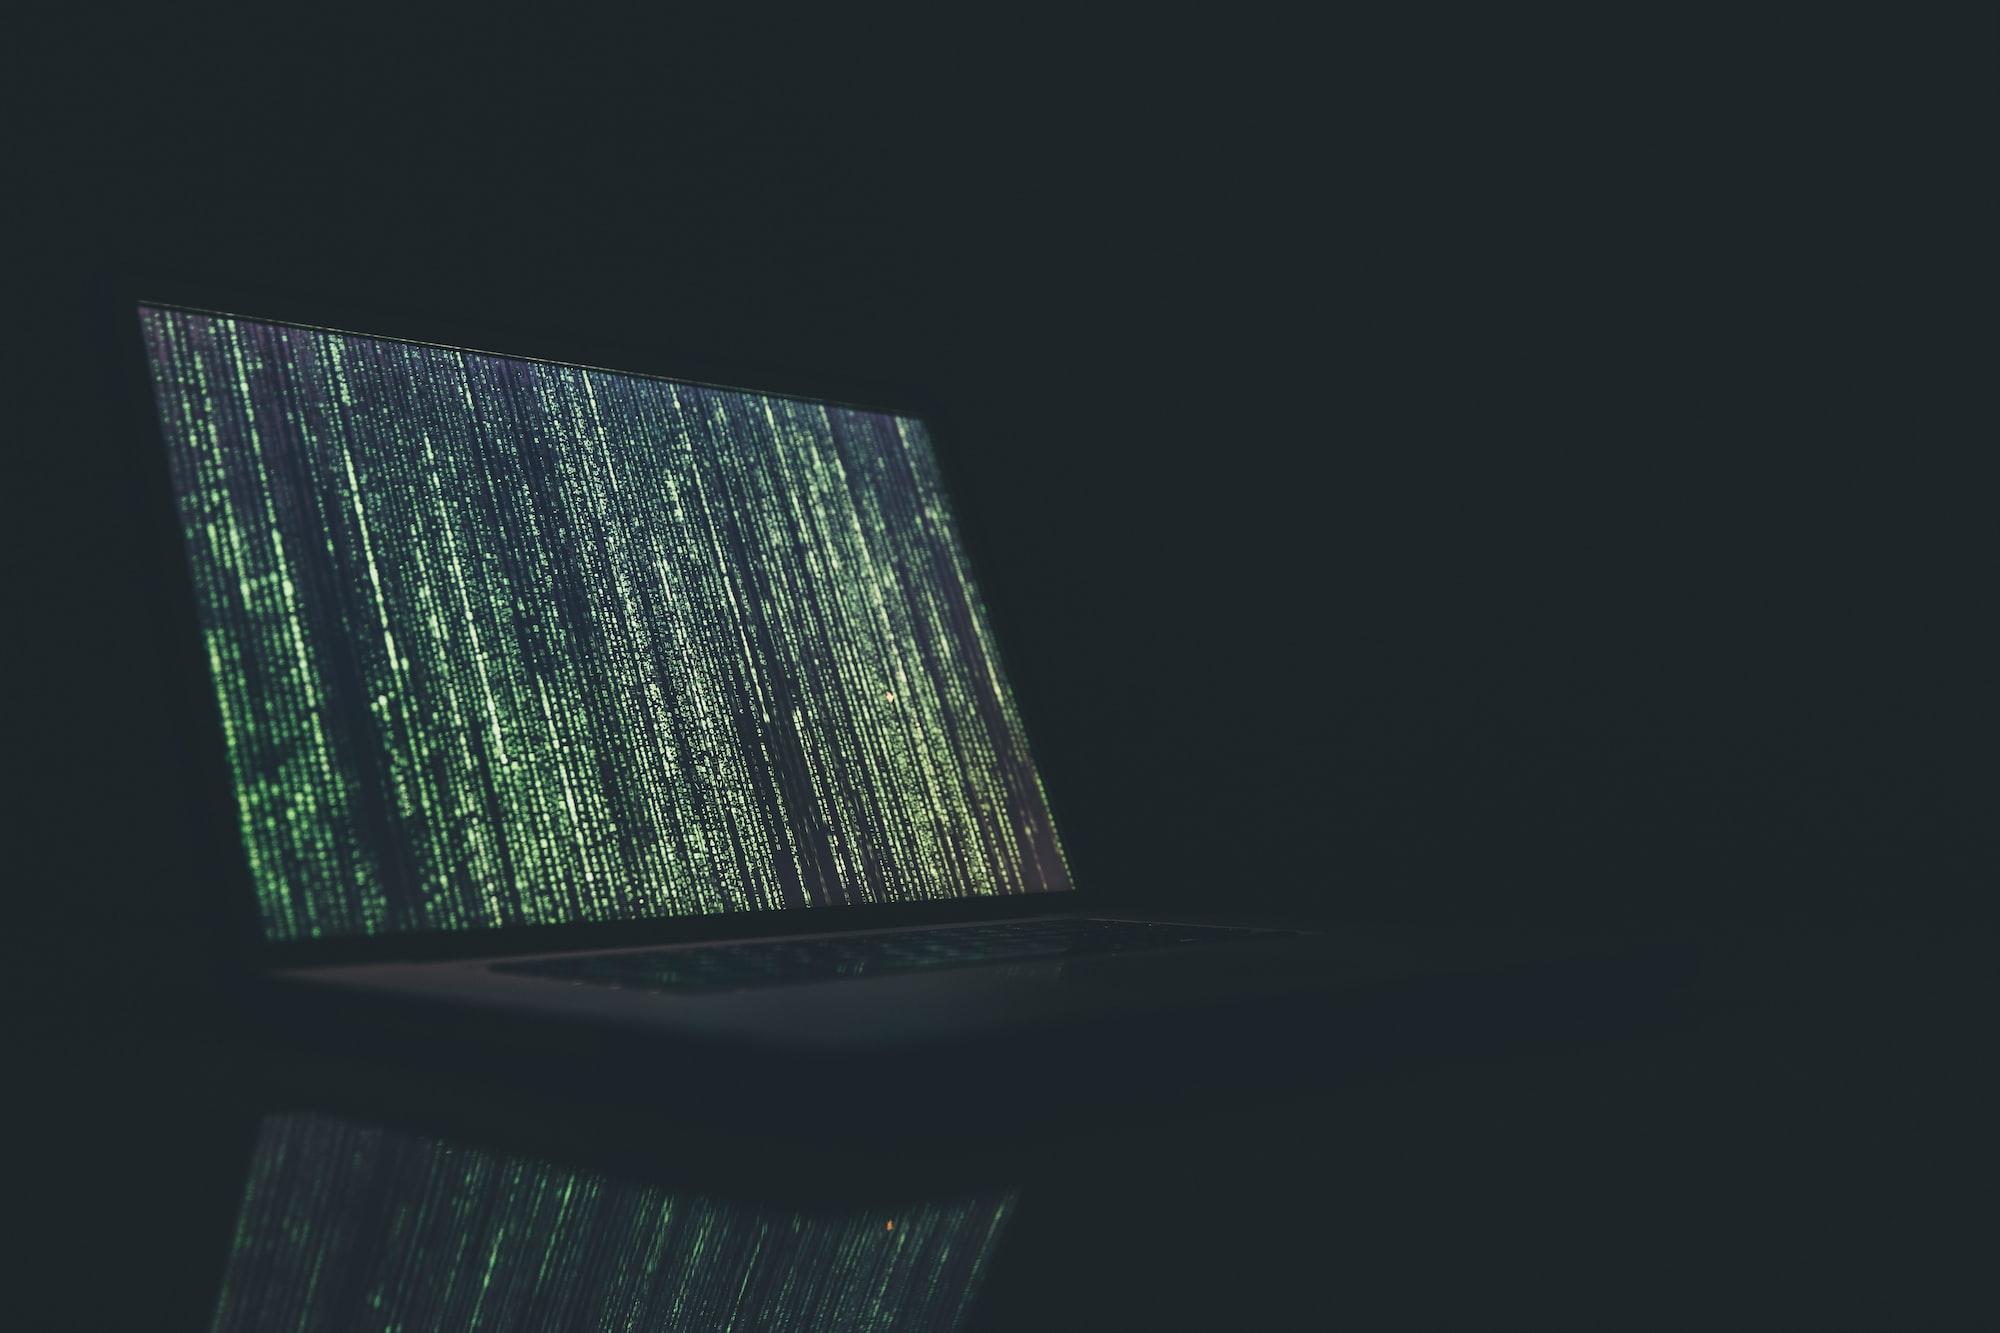 Self hosting your own Matrix server on a Raspberry Pi